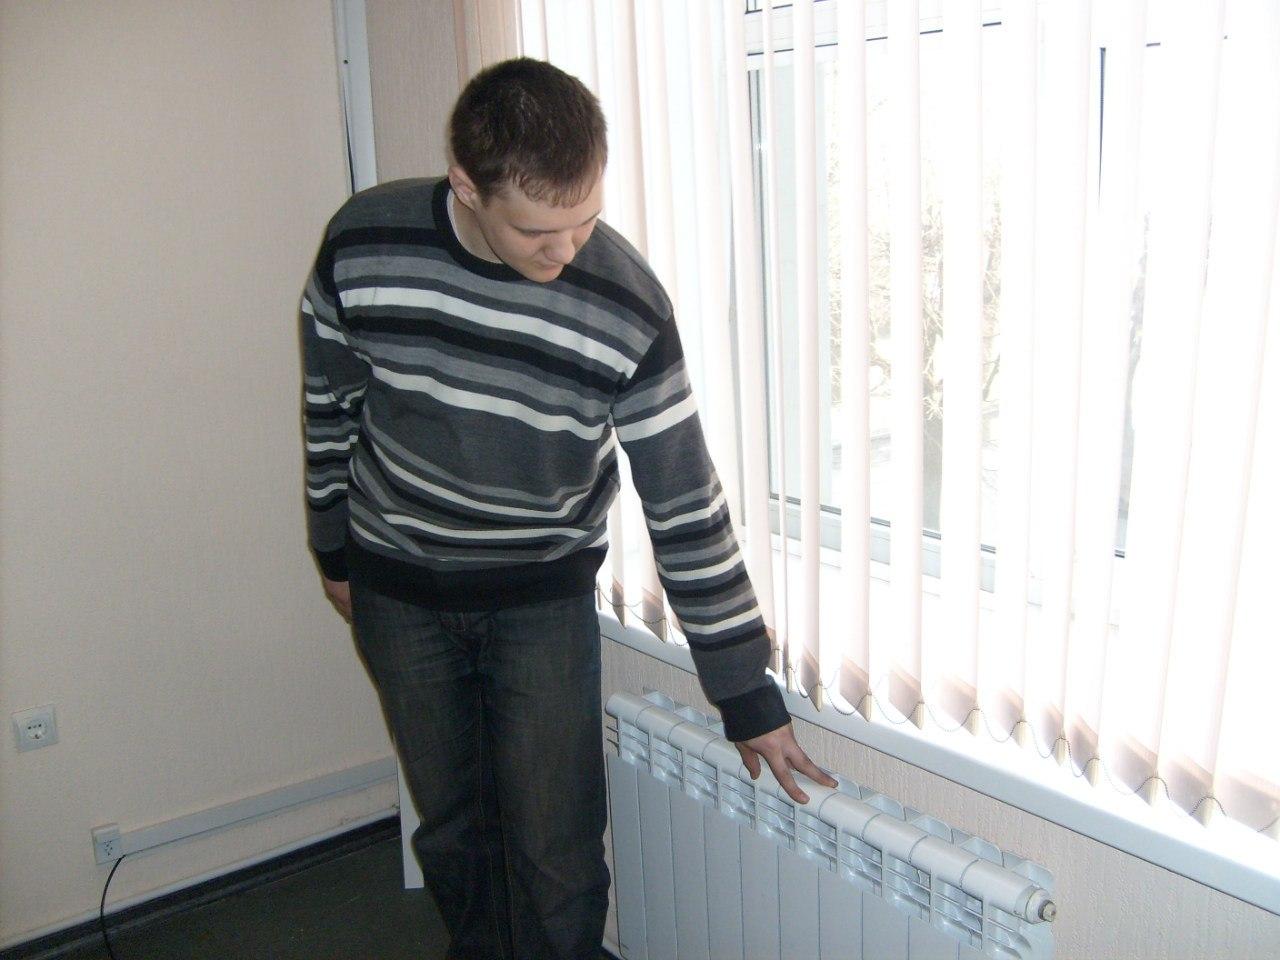 Стало известно, когда в Кирово-Чепецке отключат отопление